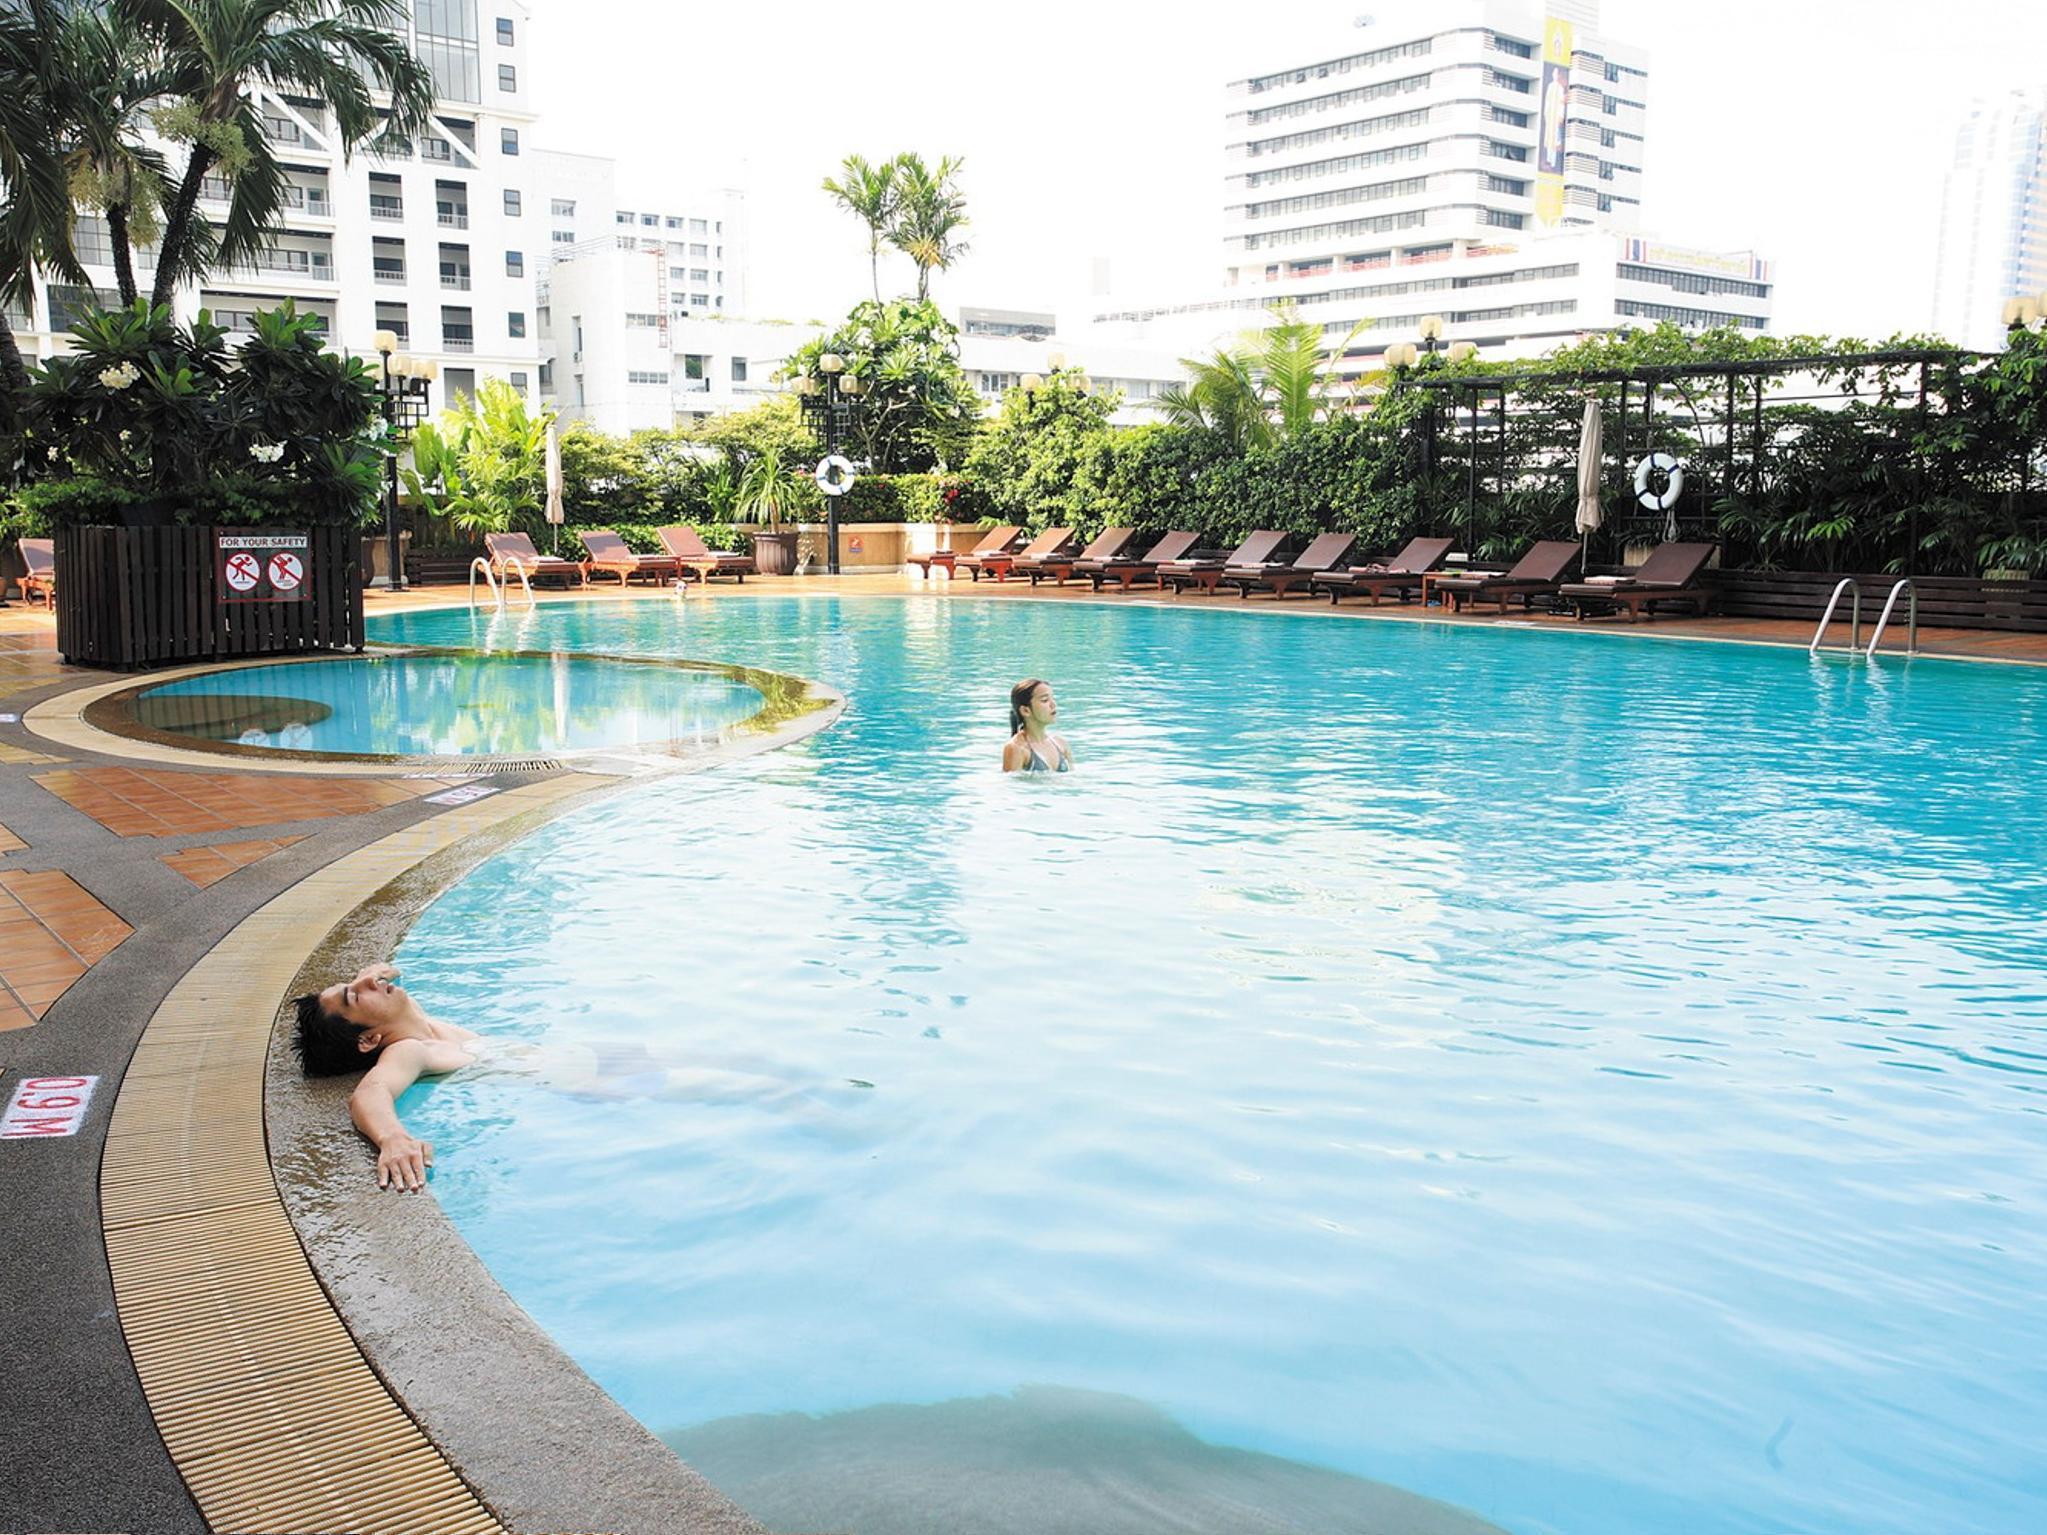 Novotel Bangkok On Siam Square Hotel โรงแรมโนโวเทล กรุงเทพ สยามสแควร์